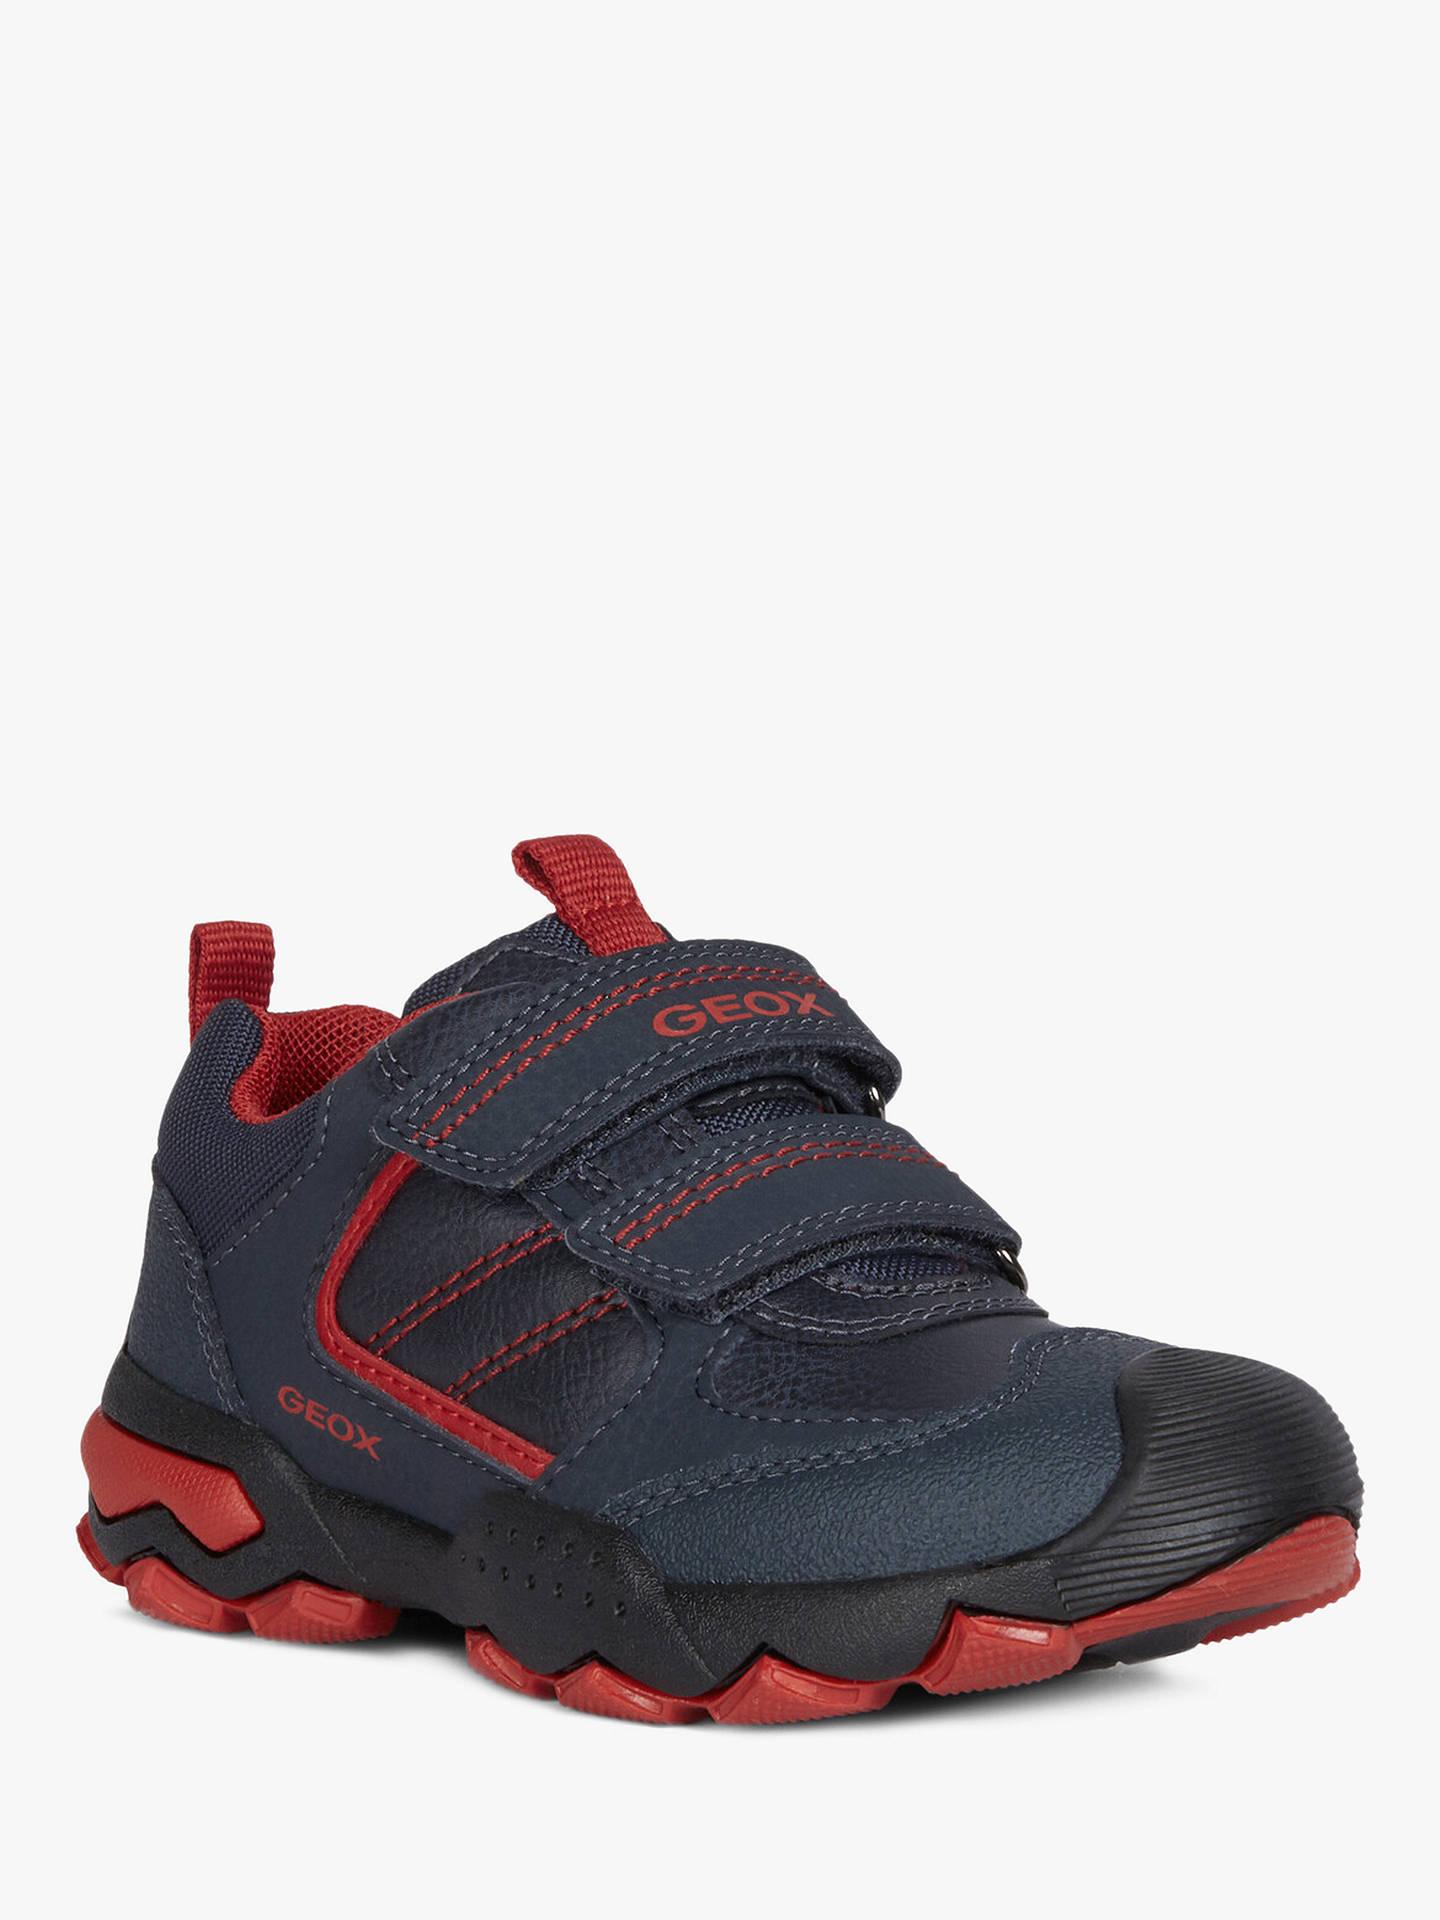 new concept b07ec ae5b2 Geox Children's Buller Shoes, Navy/Dark Red at John Lewis ...